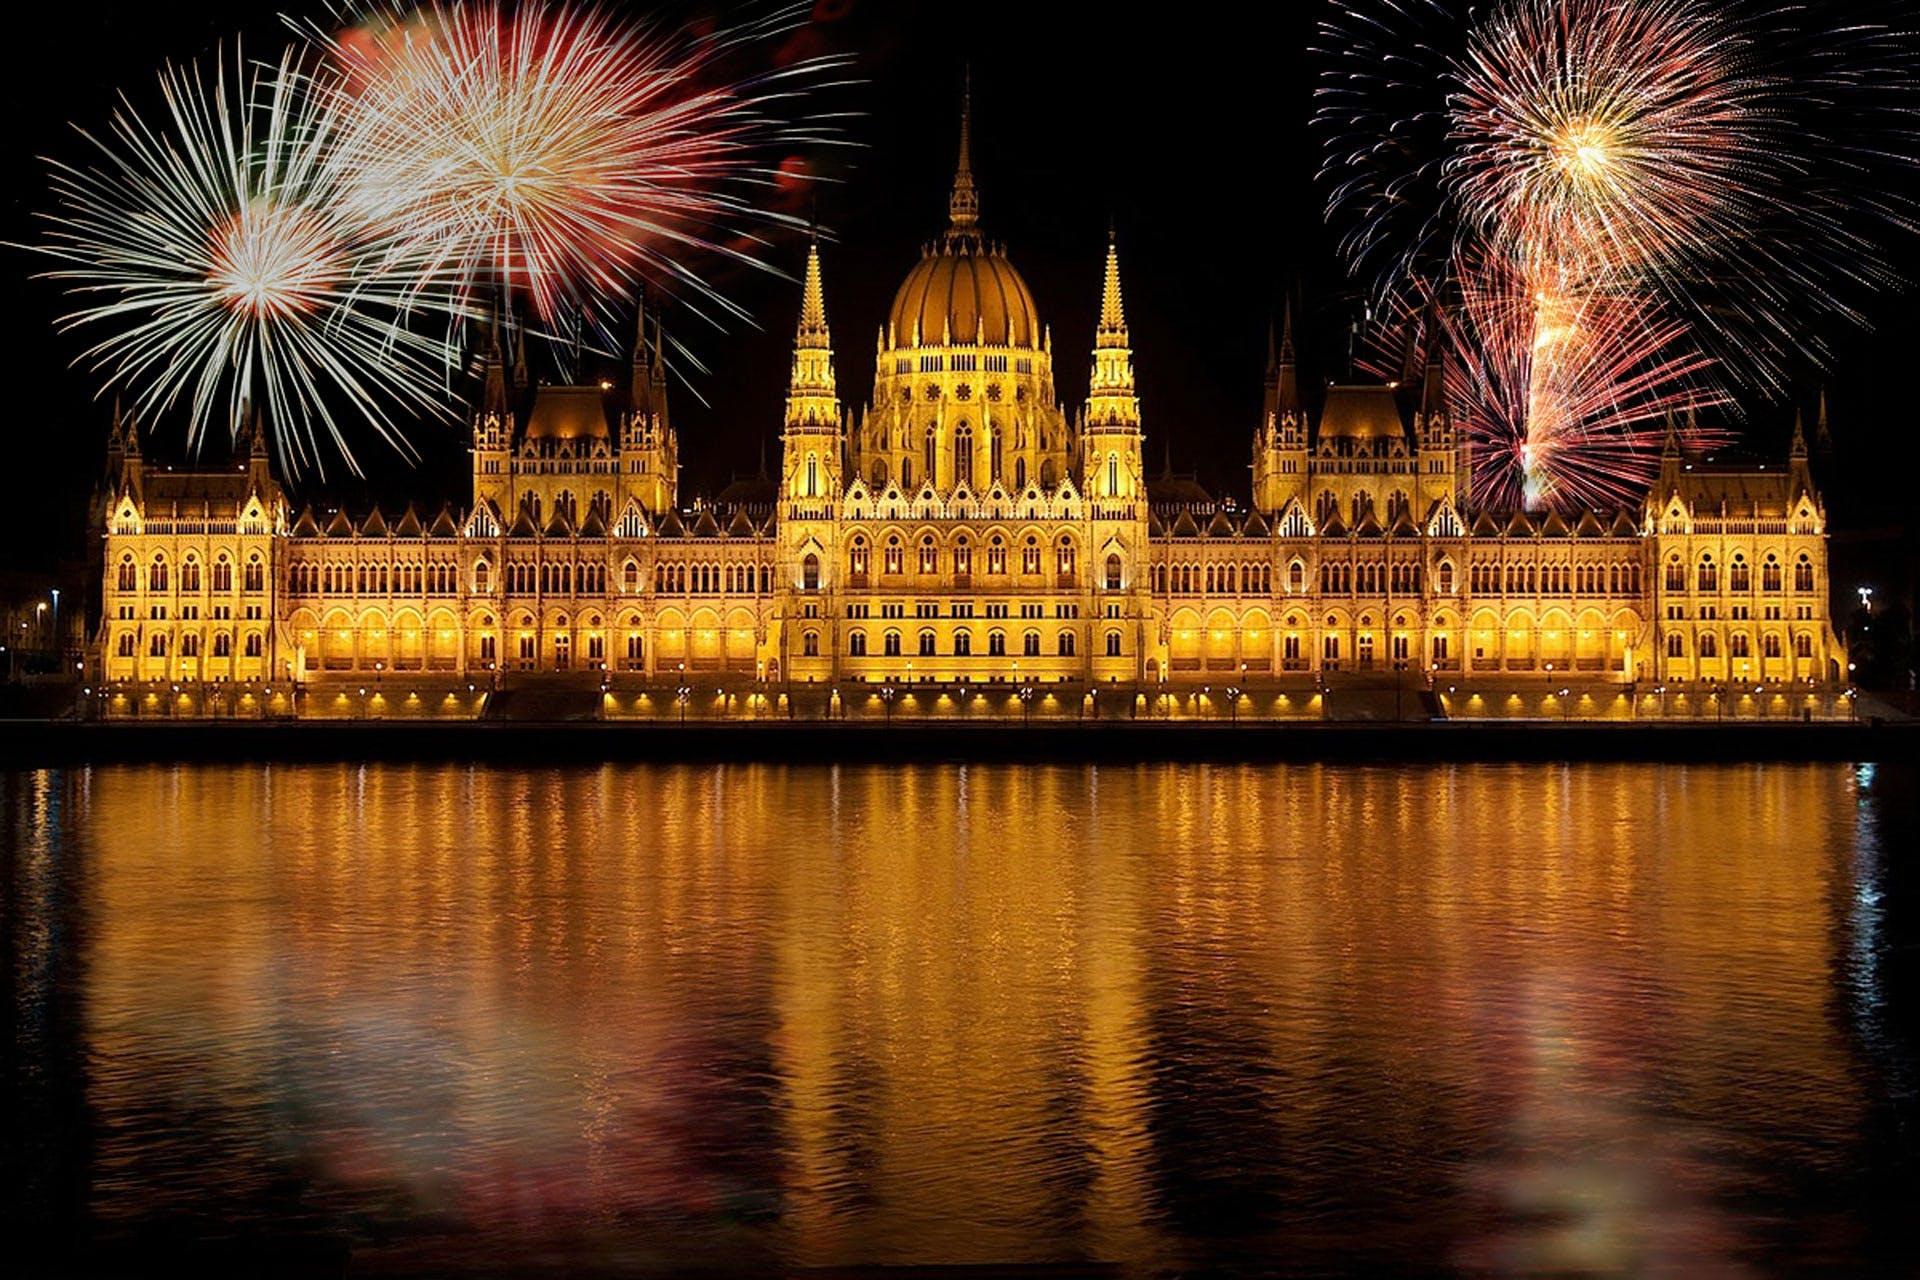 Brown Concrete Establishment Surrounded by Fireworks